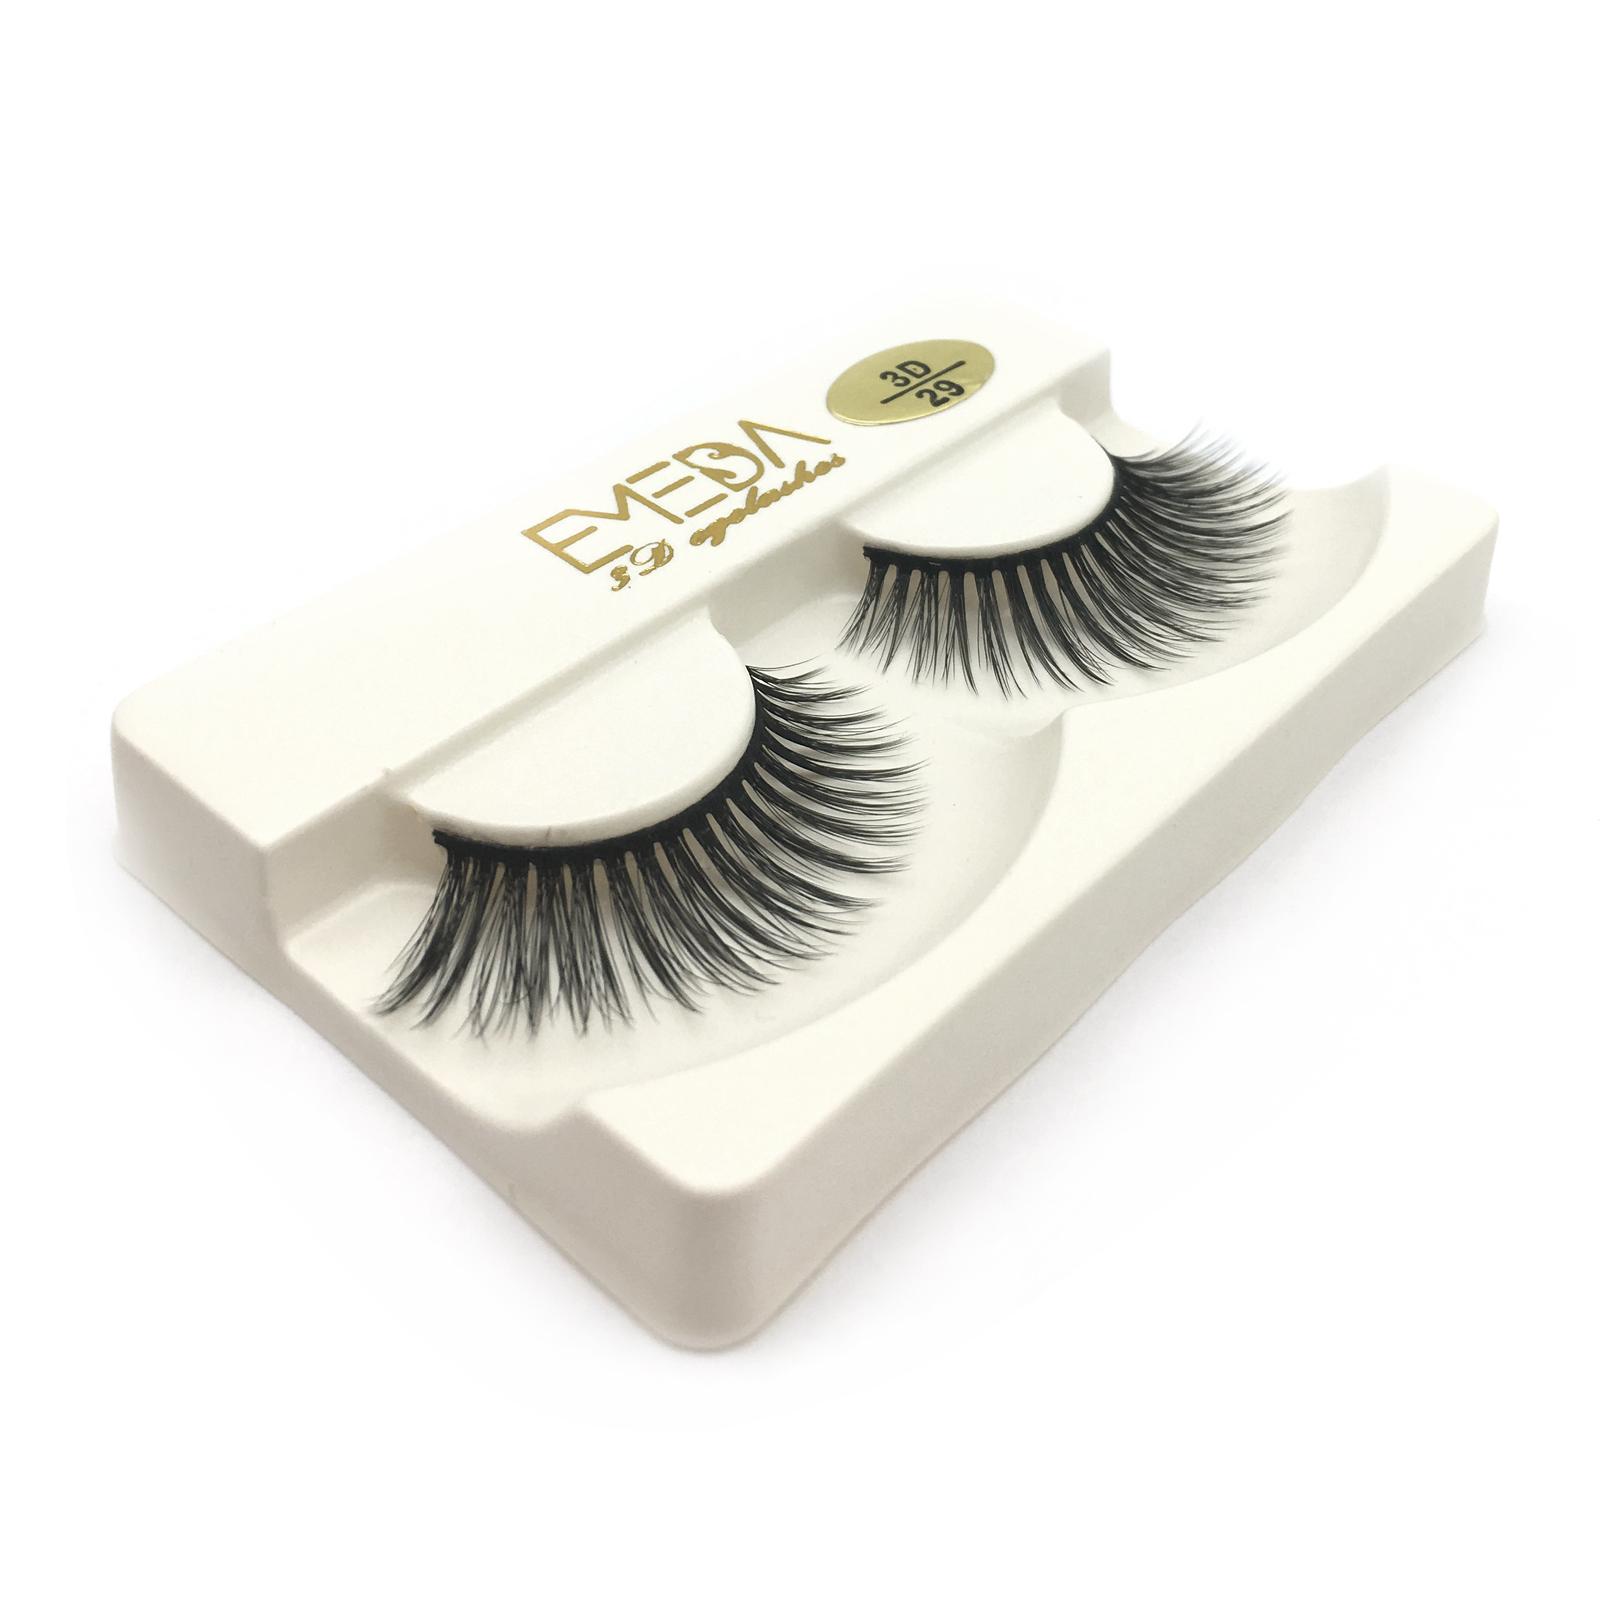 854728a7527 3D Faux mink eyelash strip lash JE-PY1 - Emeda eyelash